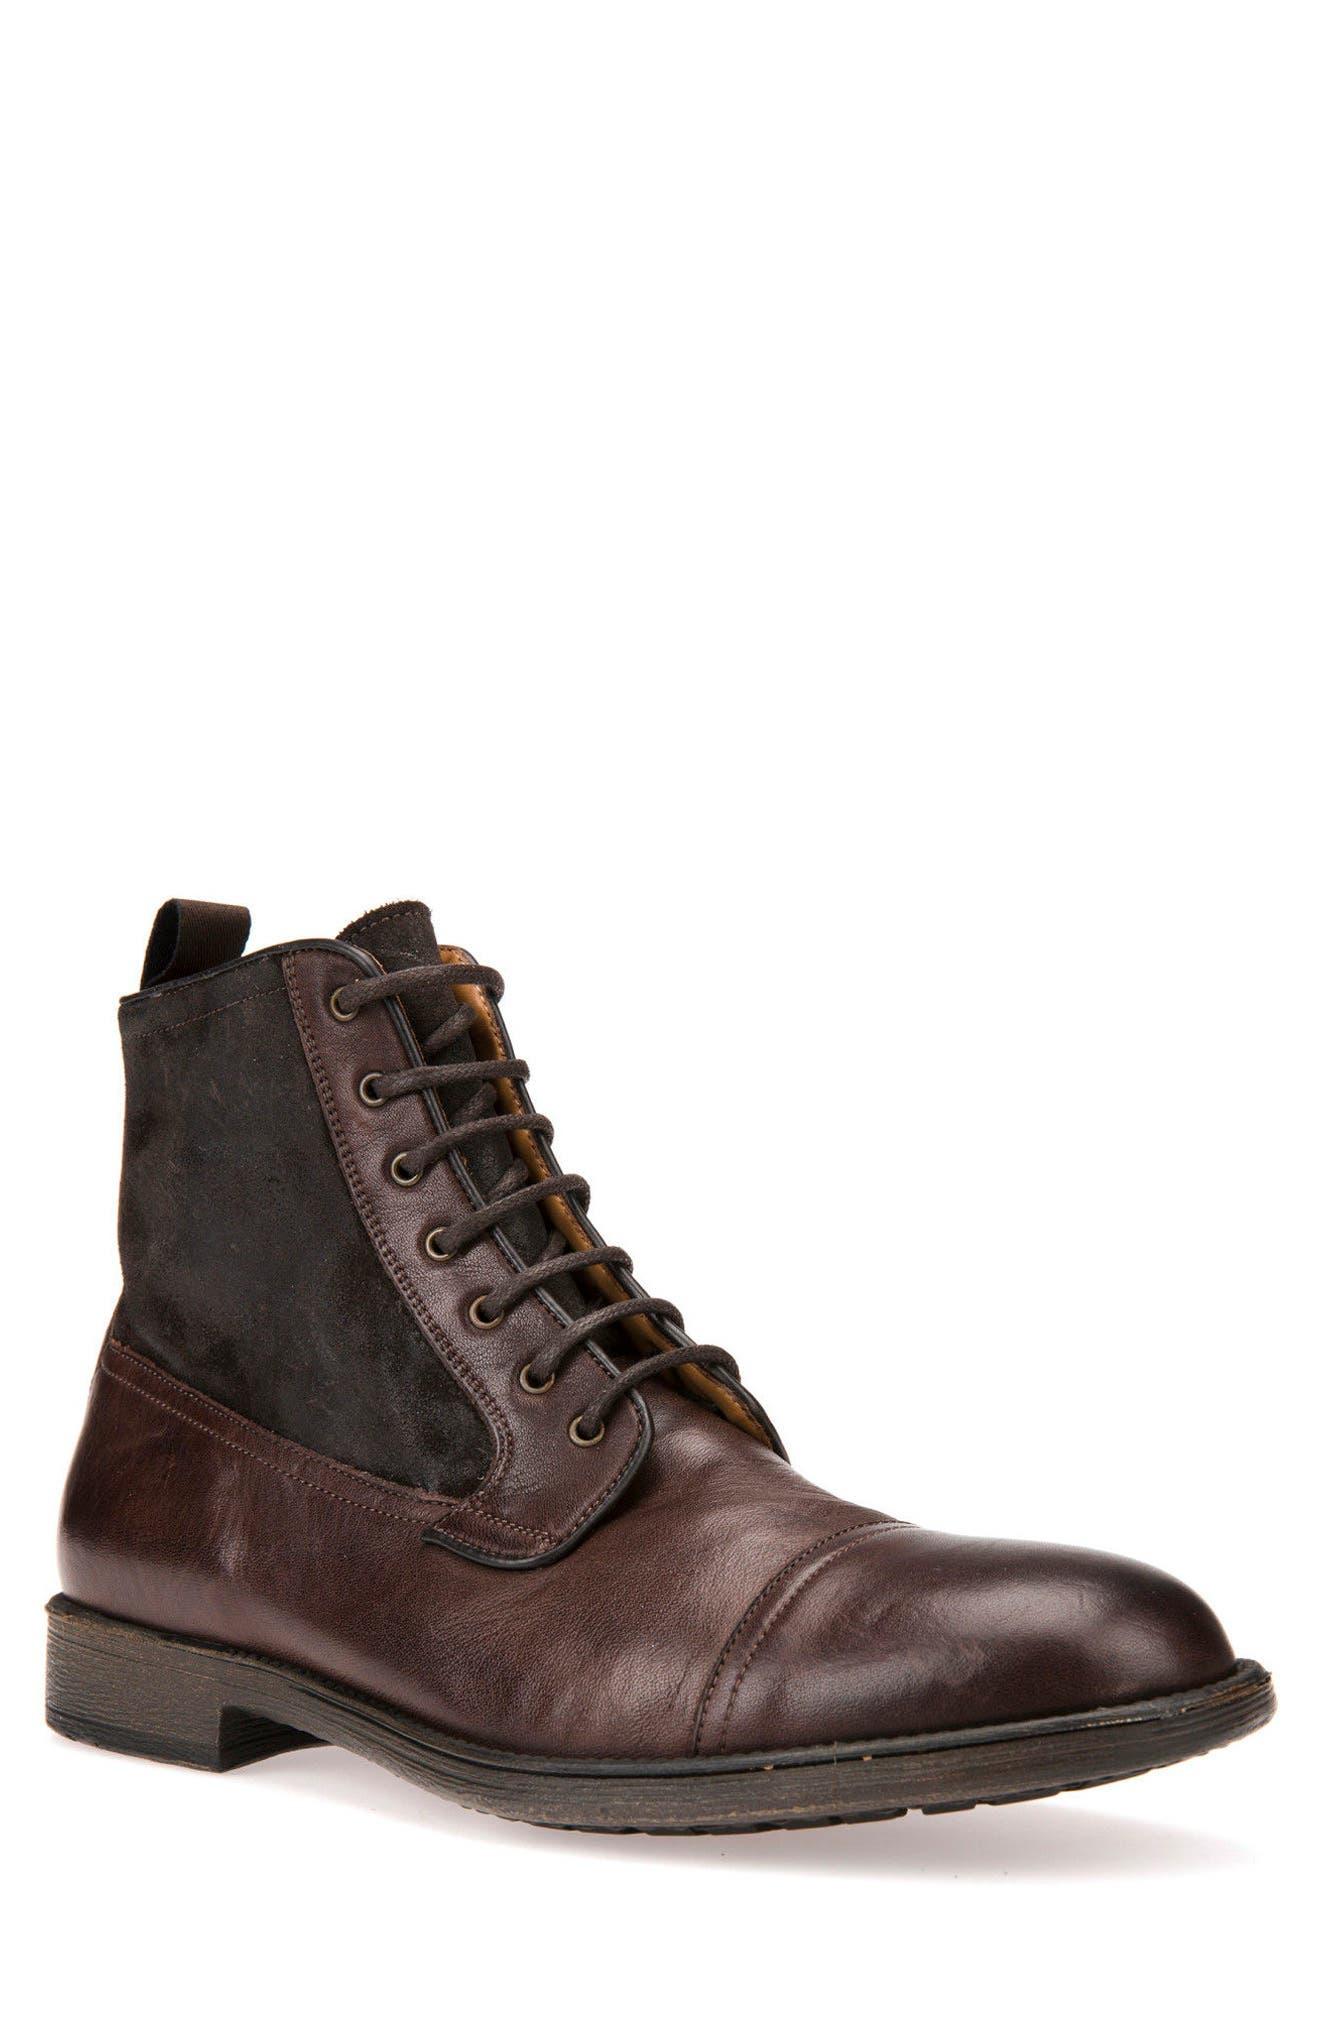 GEOX Jaylon 12 Cap-Toe Boot